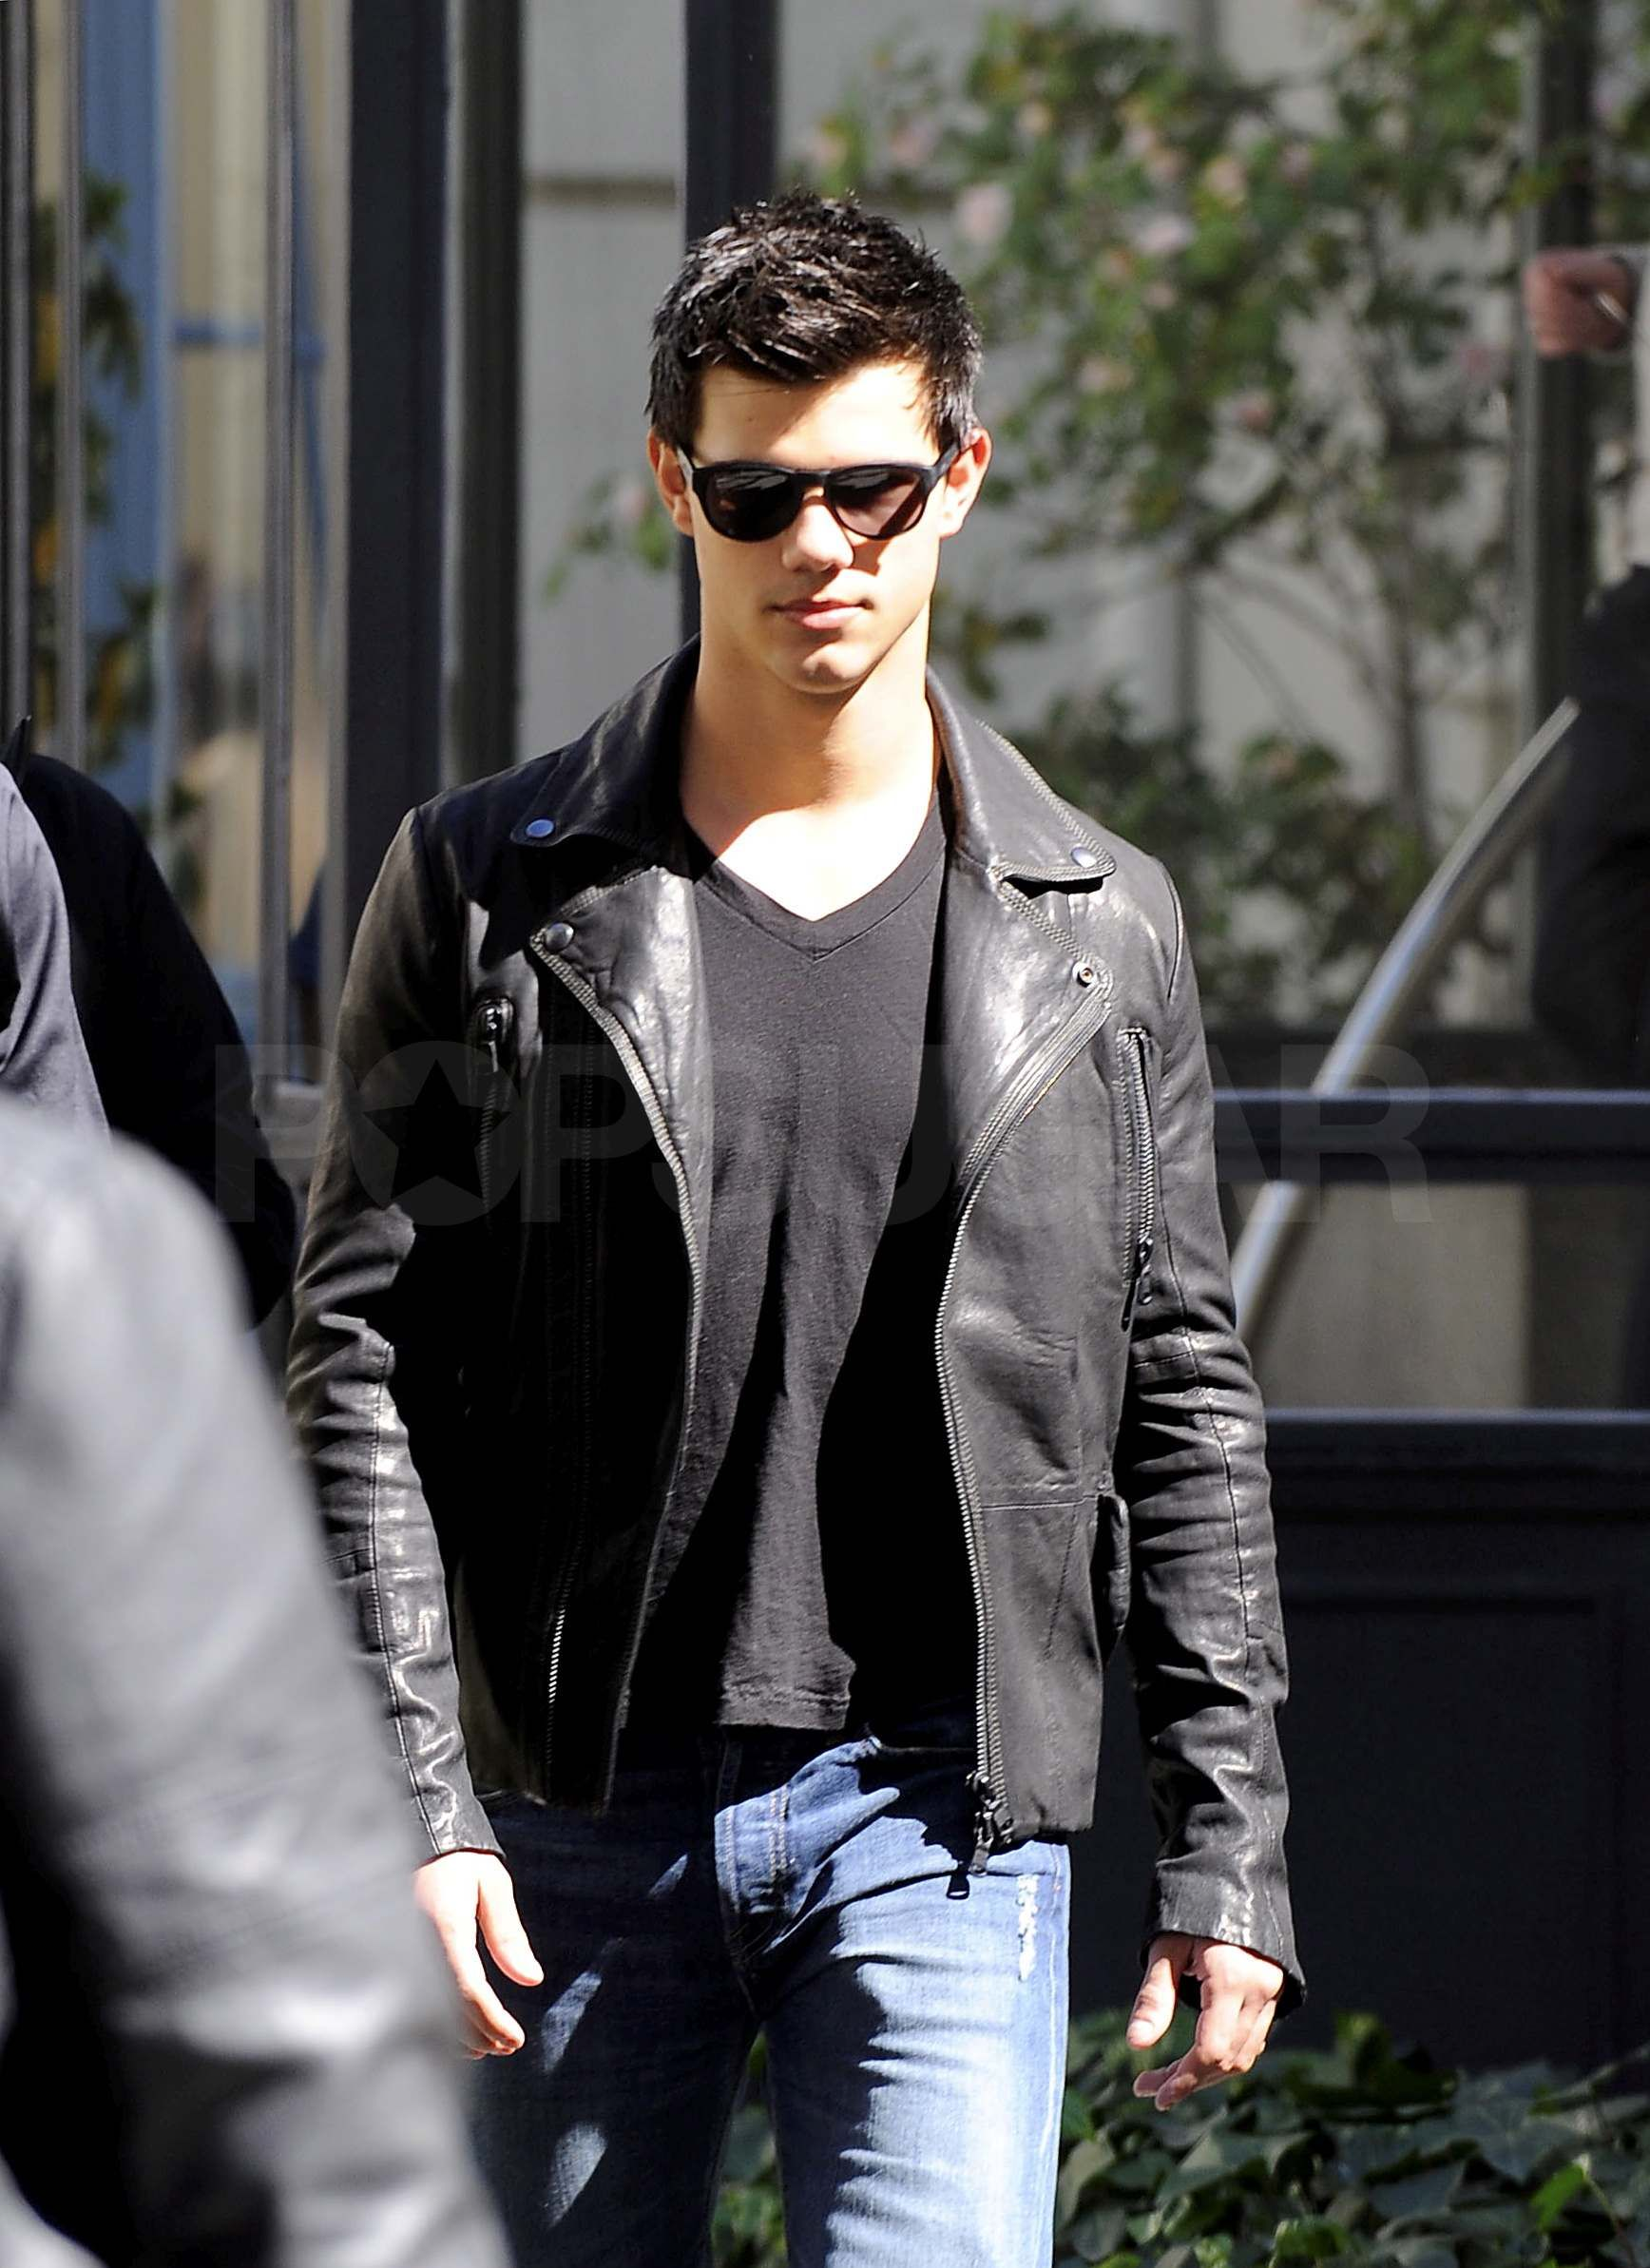 Leather jacket aesthetic - Taylor Lautner